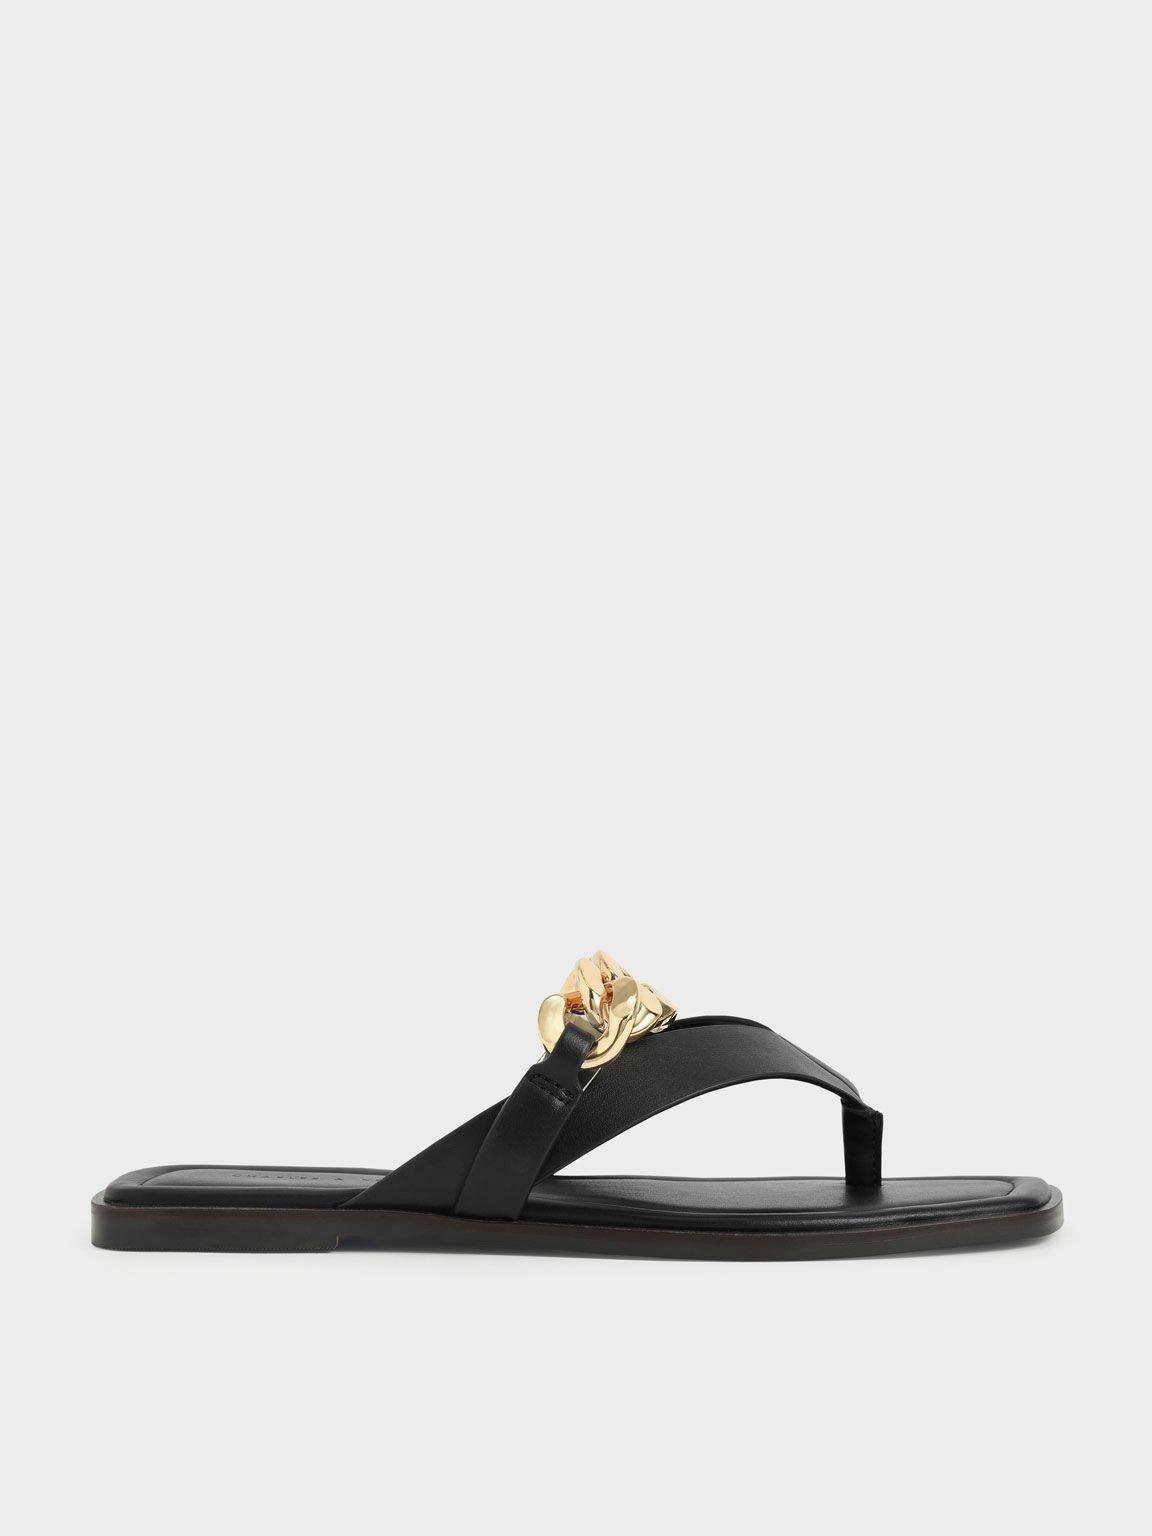 Chain Strap Thong Sandals, Black, hi-res